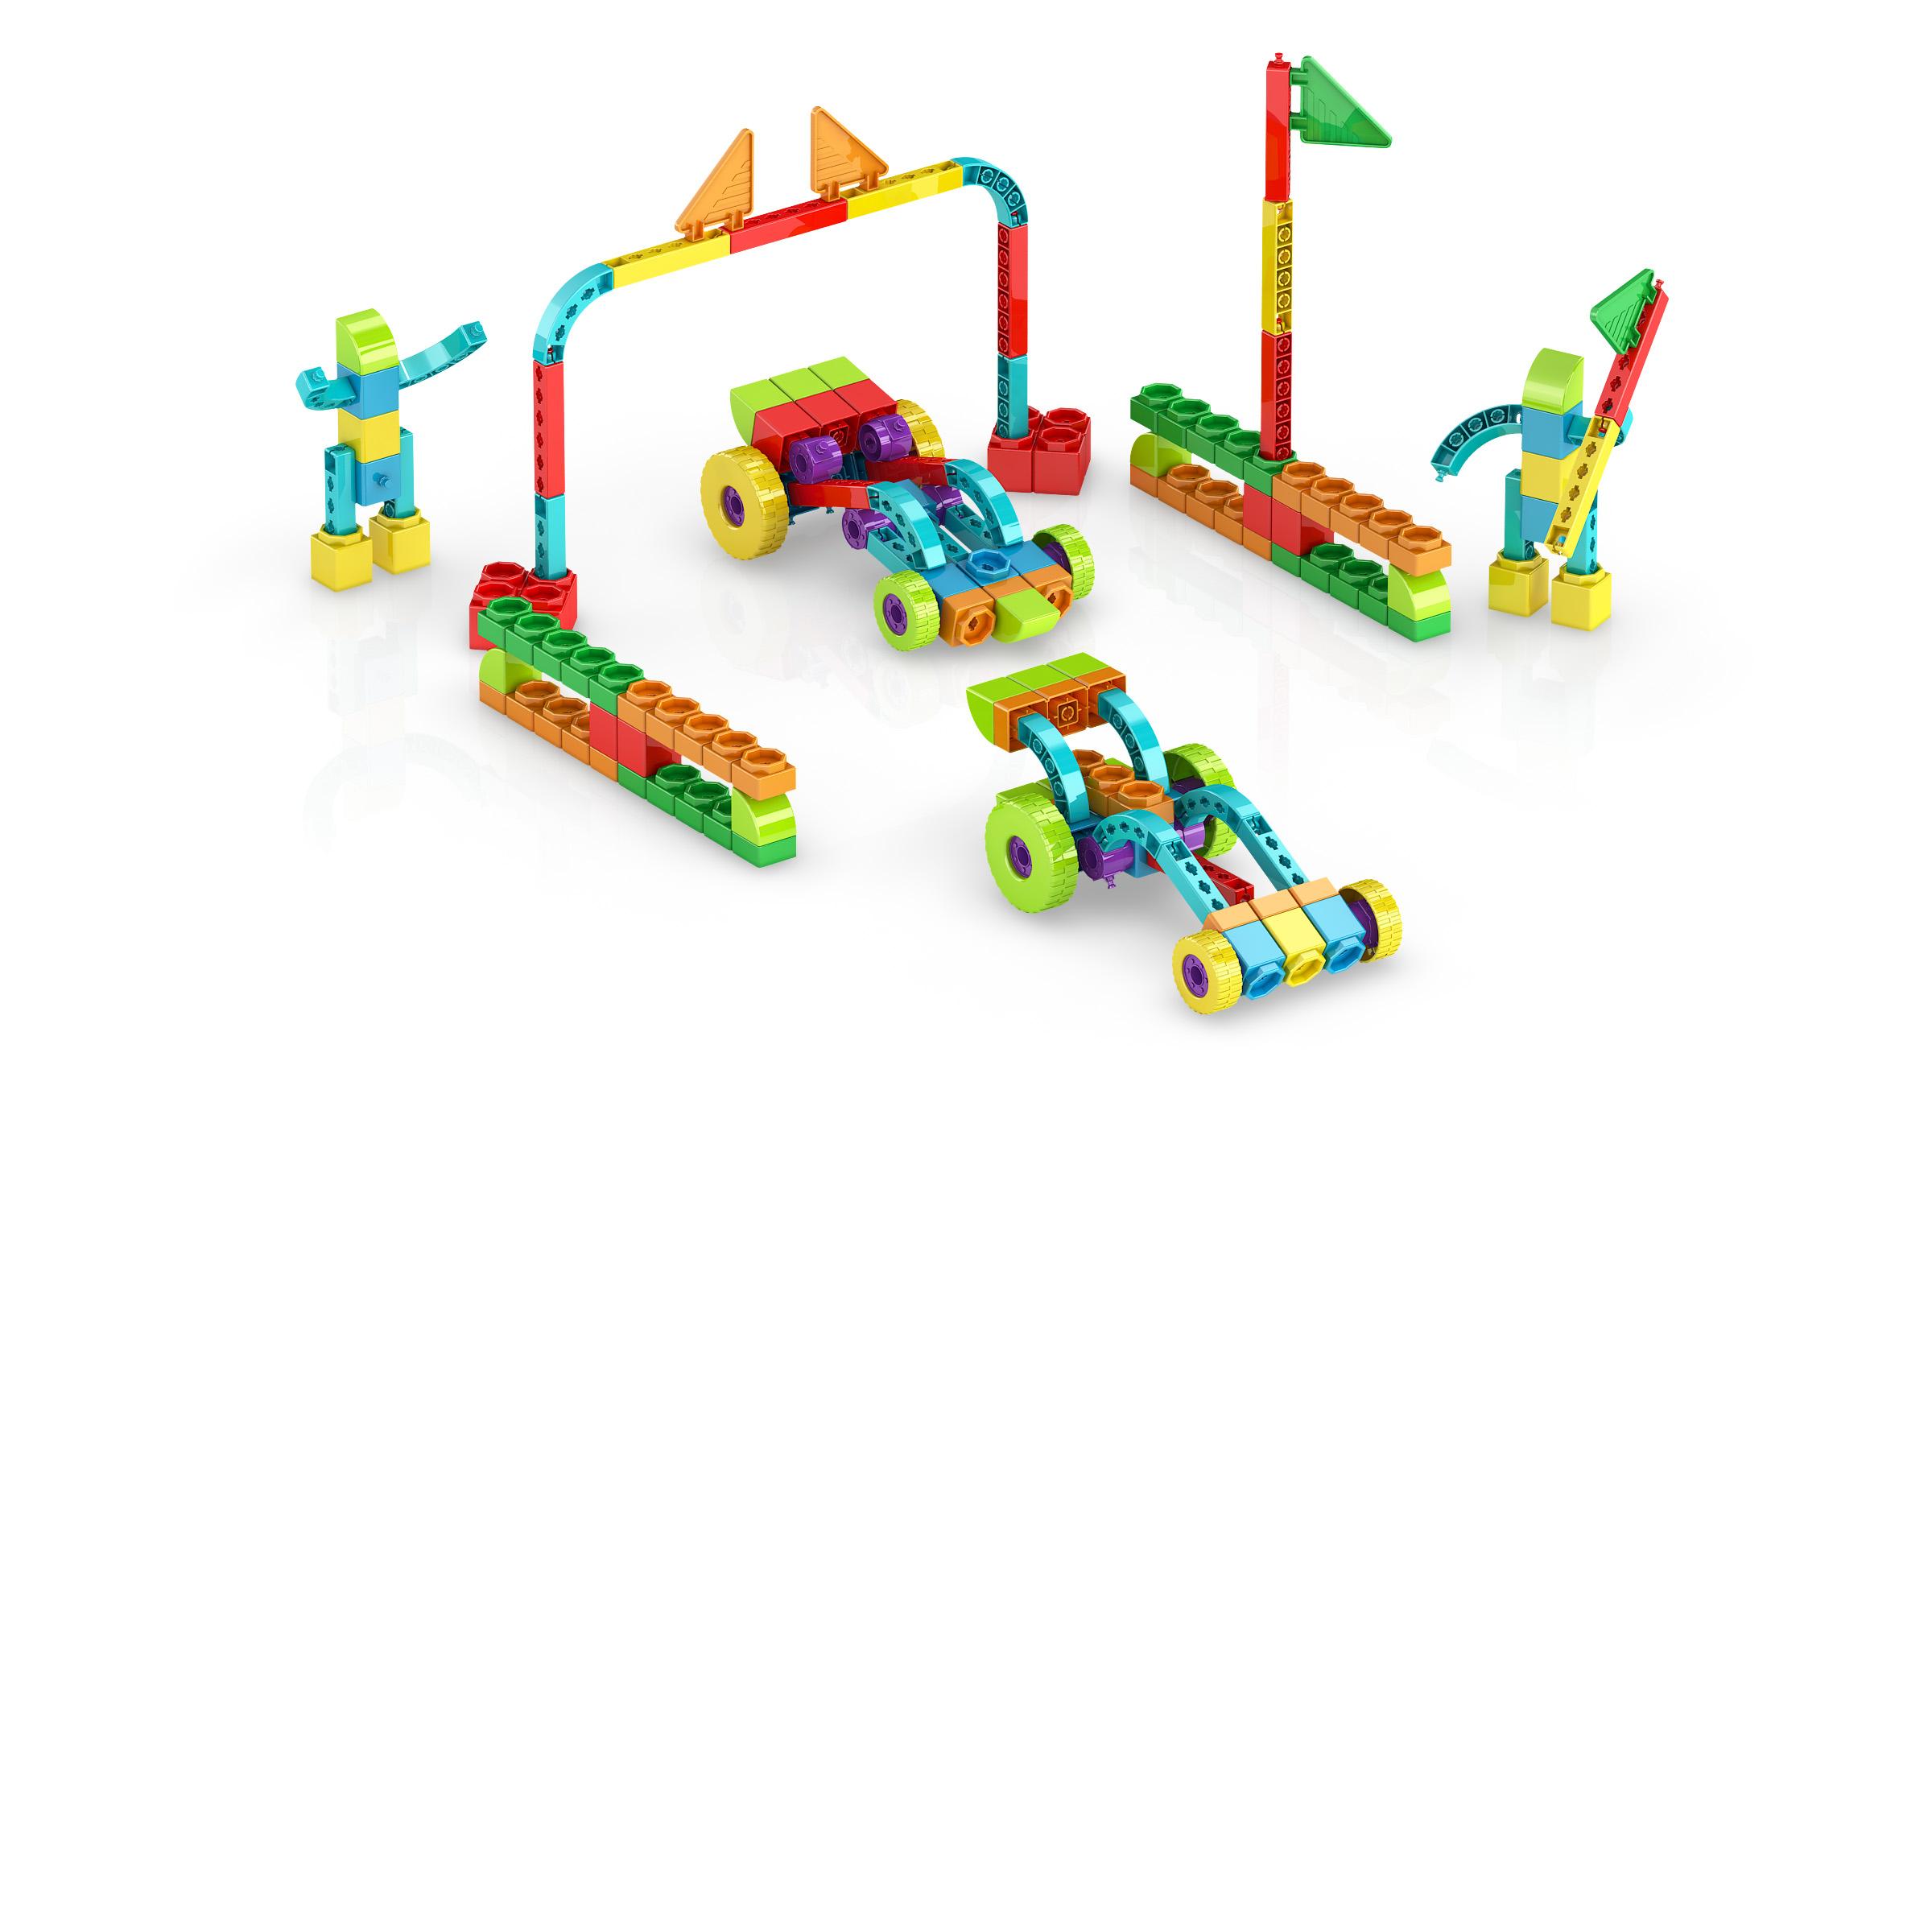 , RaceTrack 1, משחקי חשיבה לילדים engino, משחקים לגיל הרך playgro, משחק הרכבות אנג'ינו, משחקי רכבות